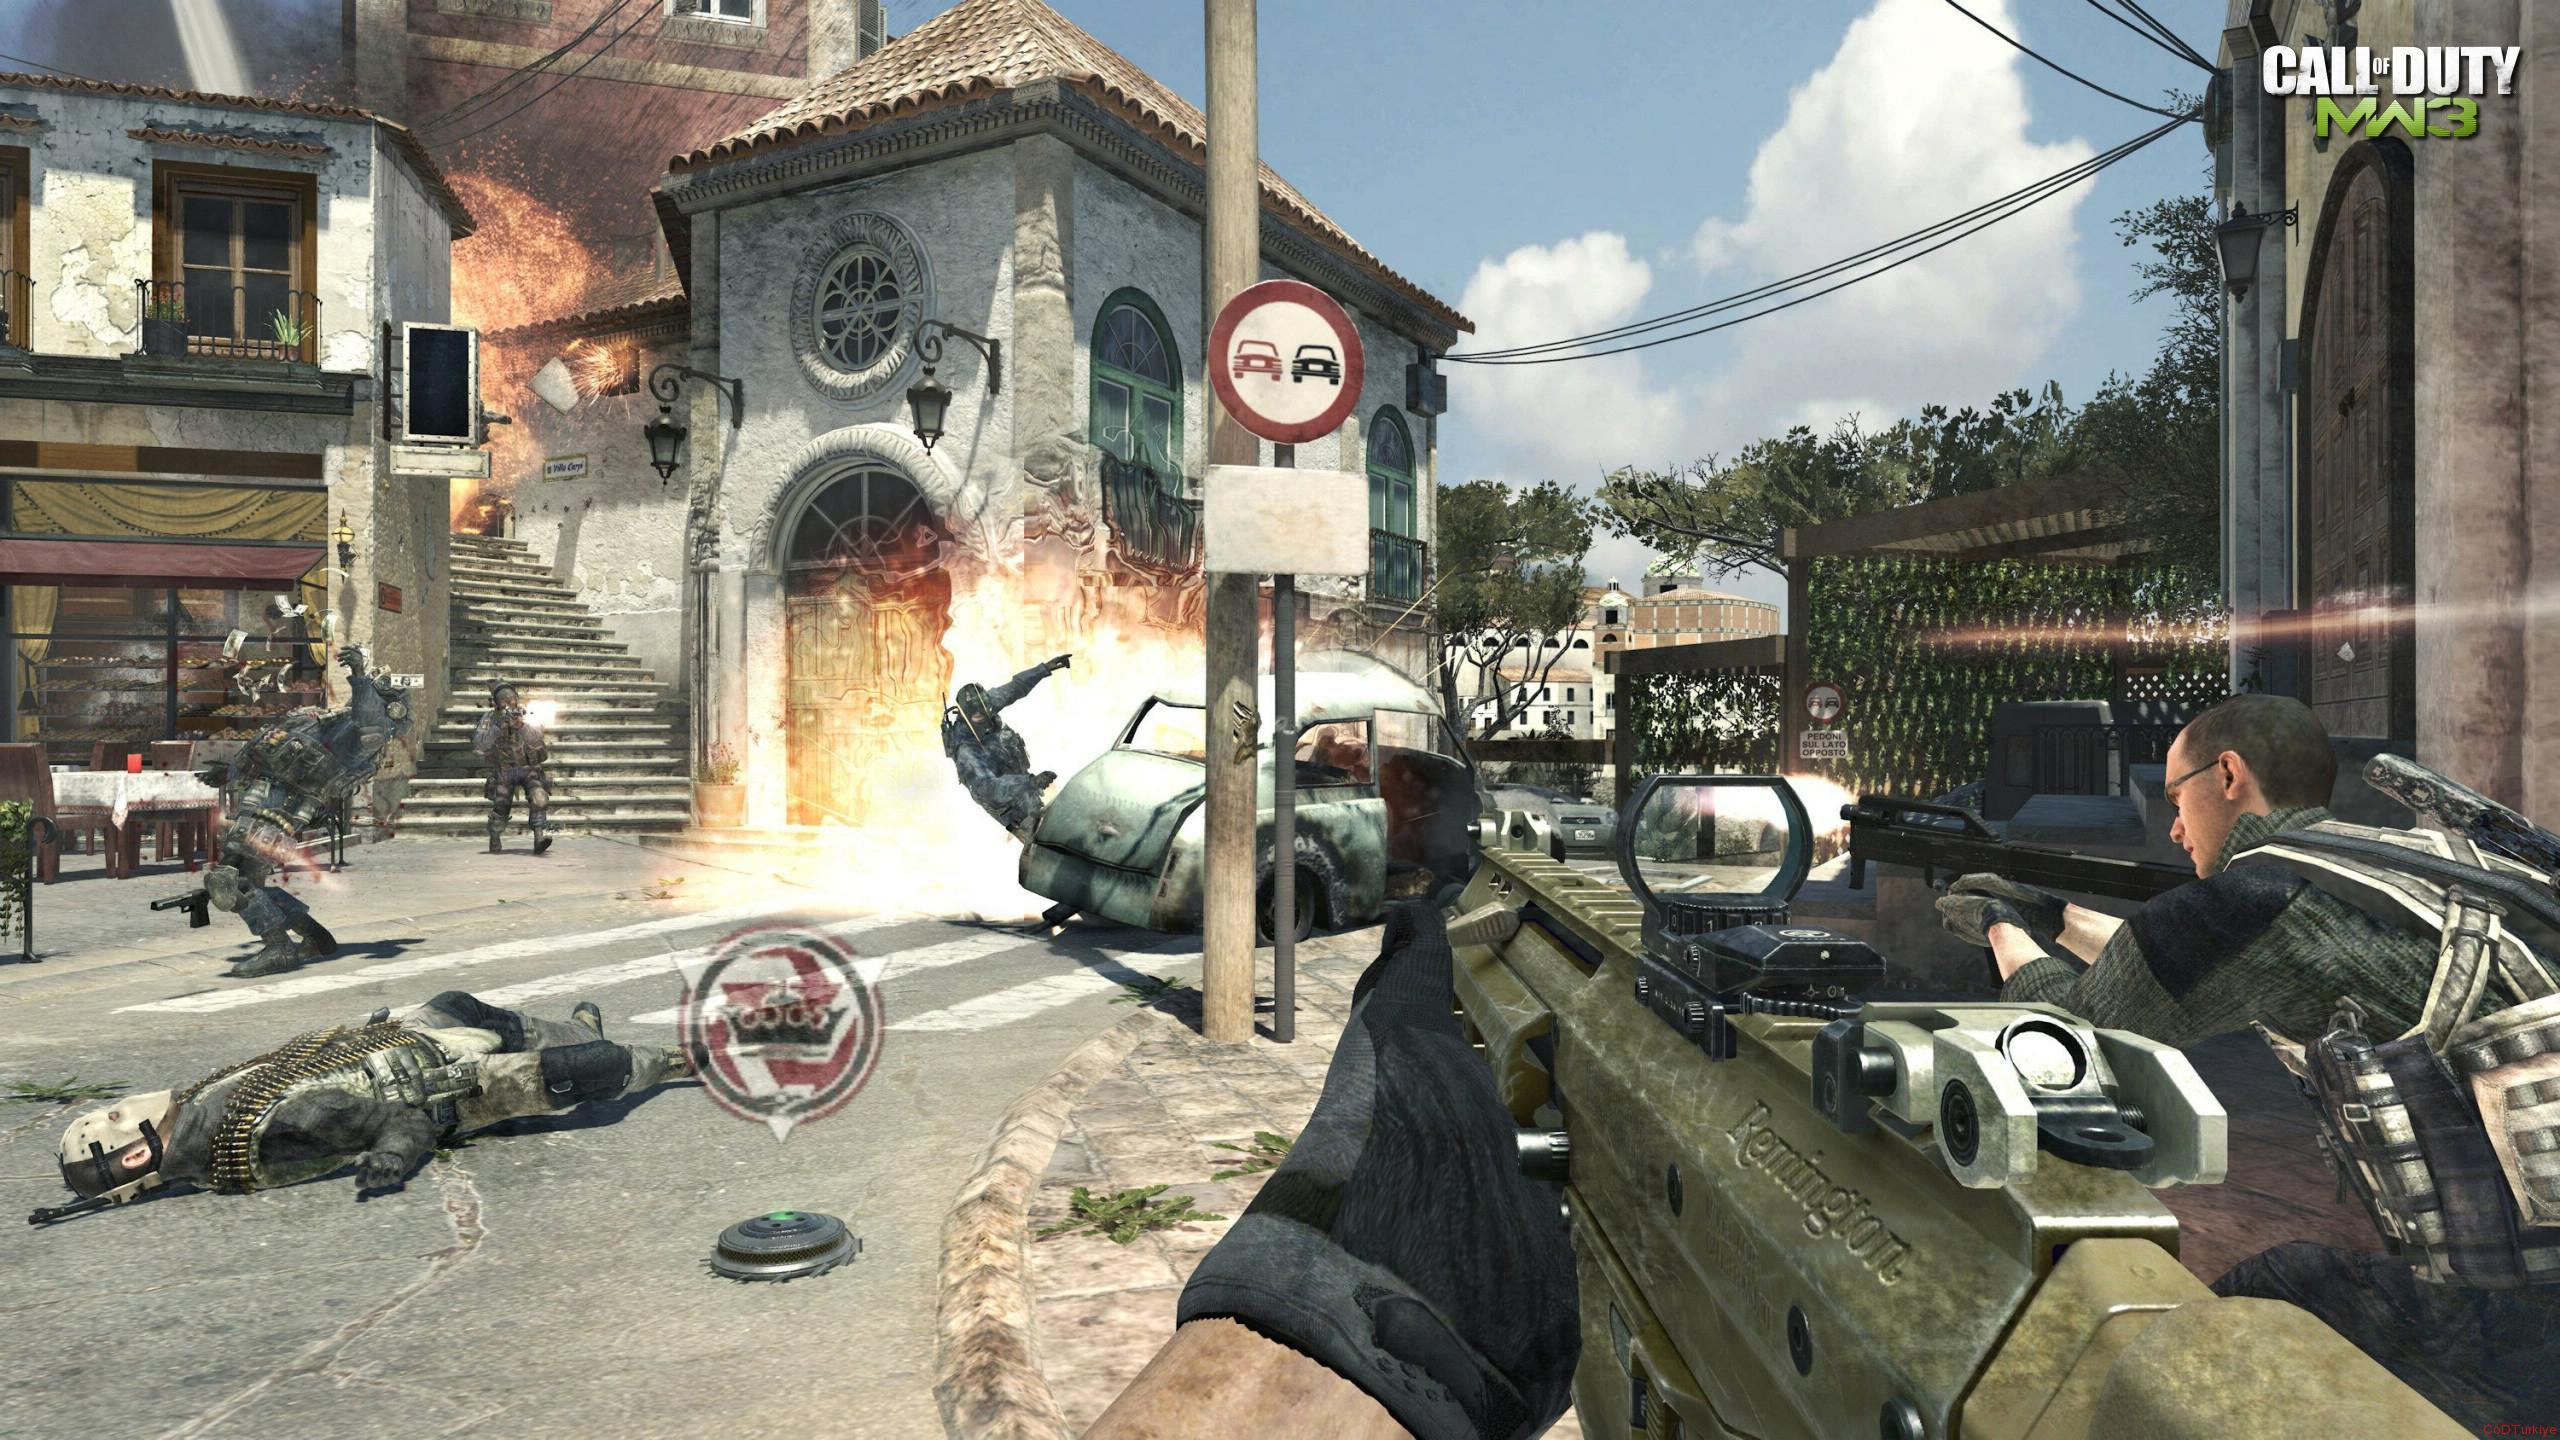 Call of Duty 8 Modern Warfare 3 Gameplay Screenshots